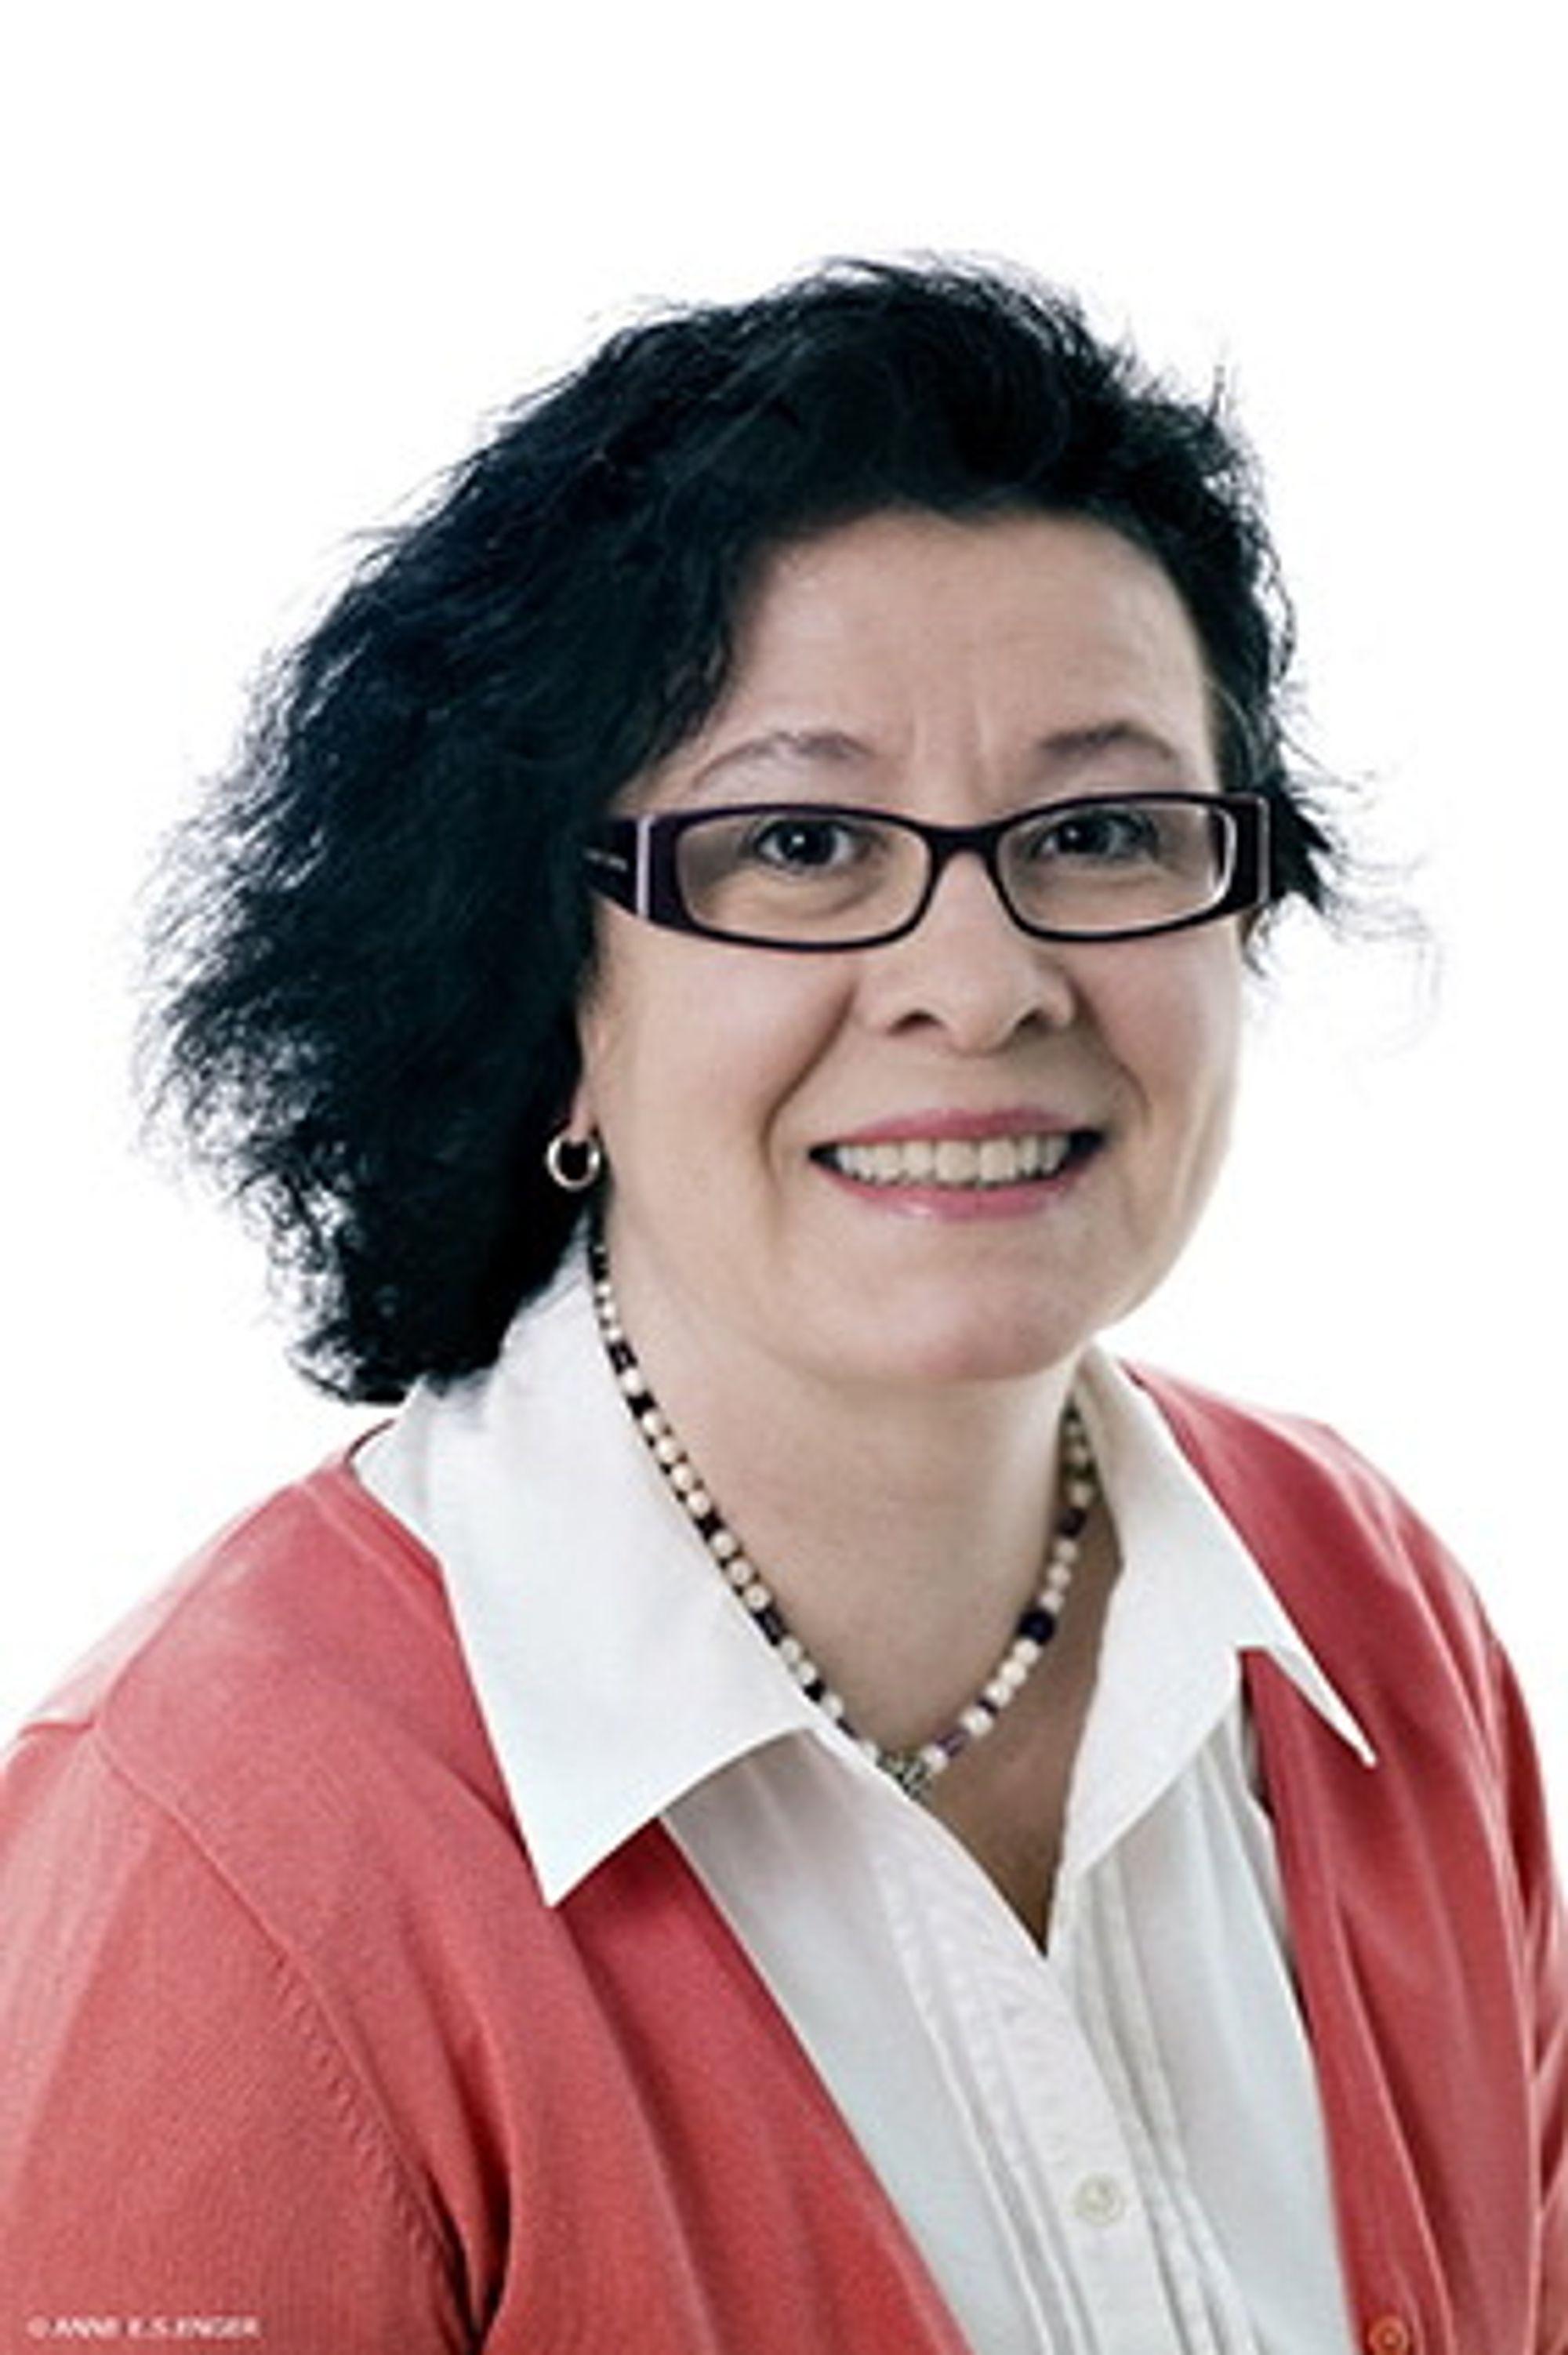 Riitta Hellman i Karde AS har ledet e-Me-prosjektet.